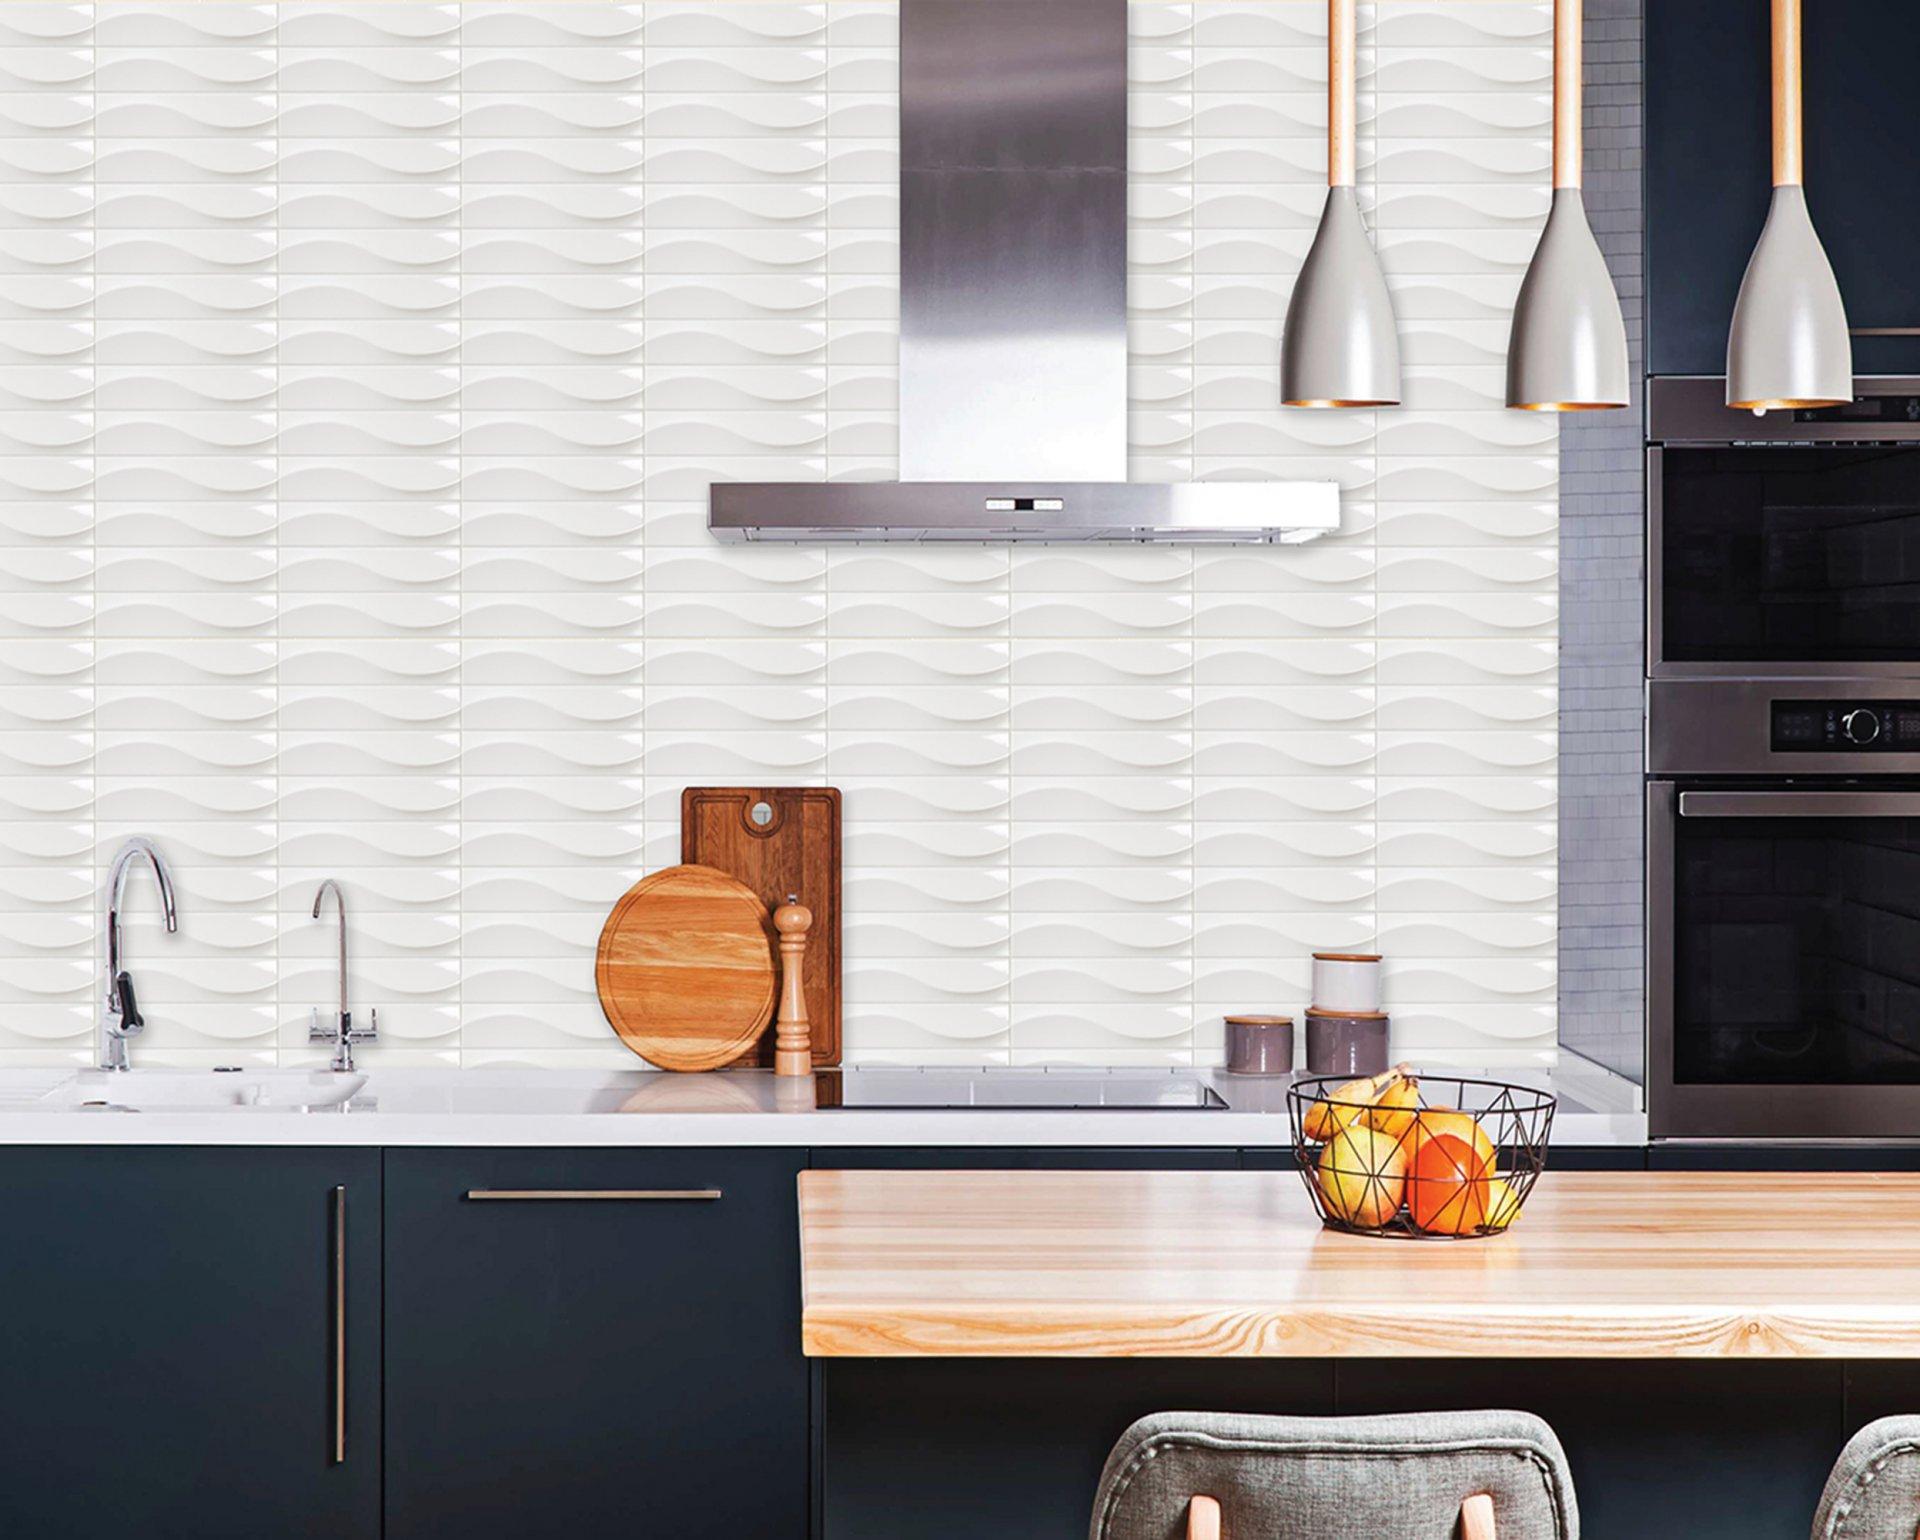 3x12 Bellini Metro Decor Blanco Ceramic Glossy Wall